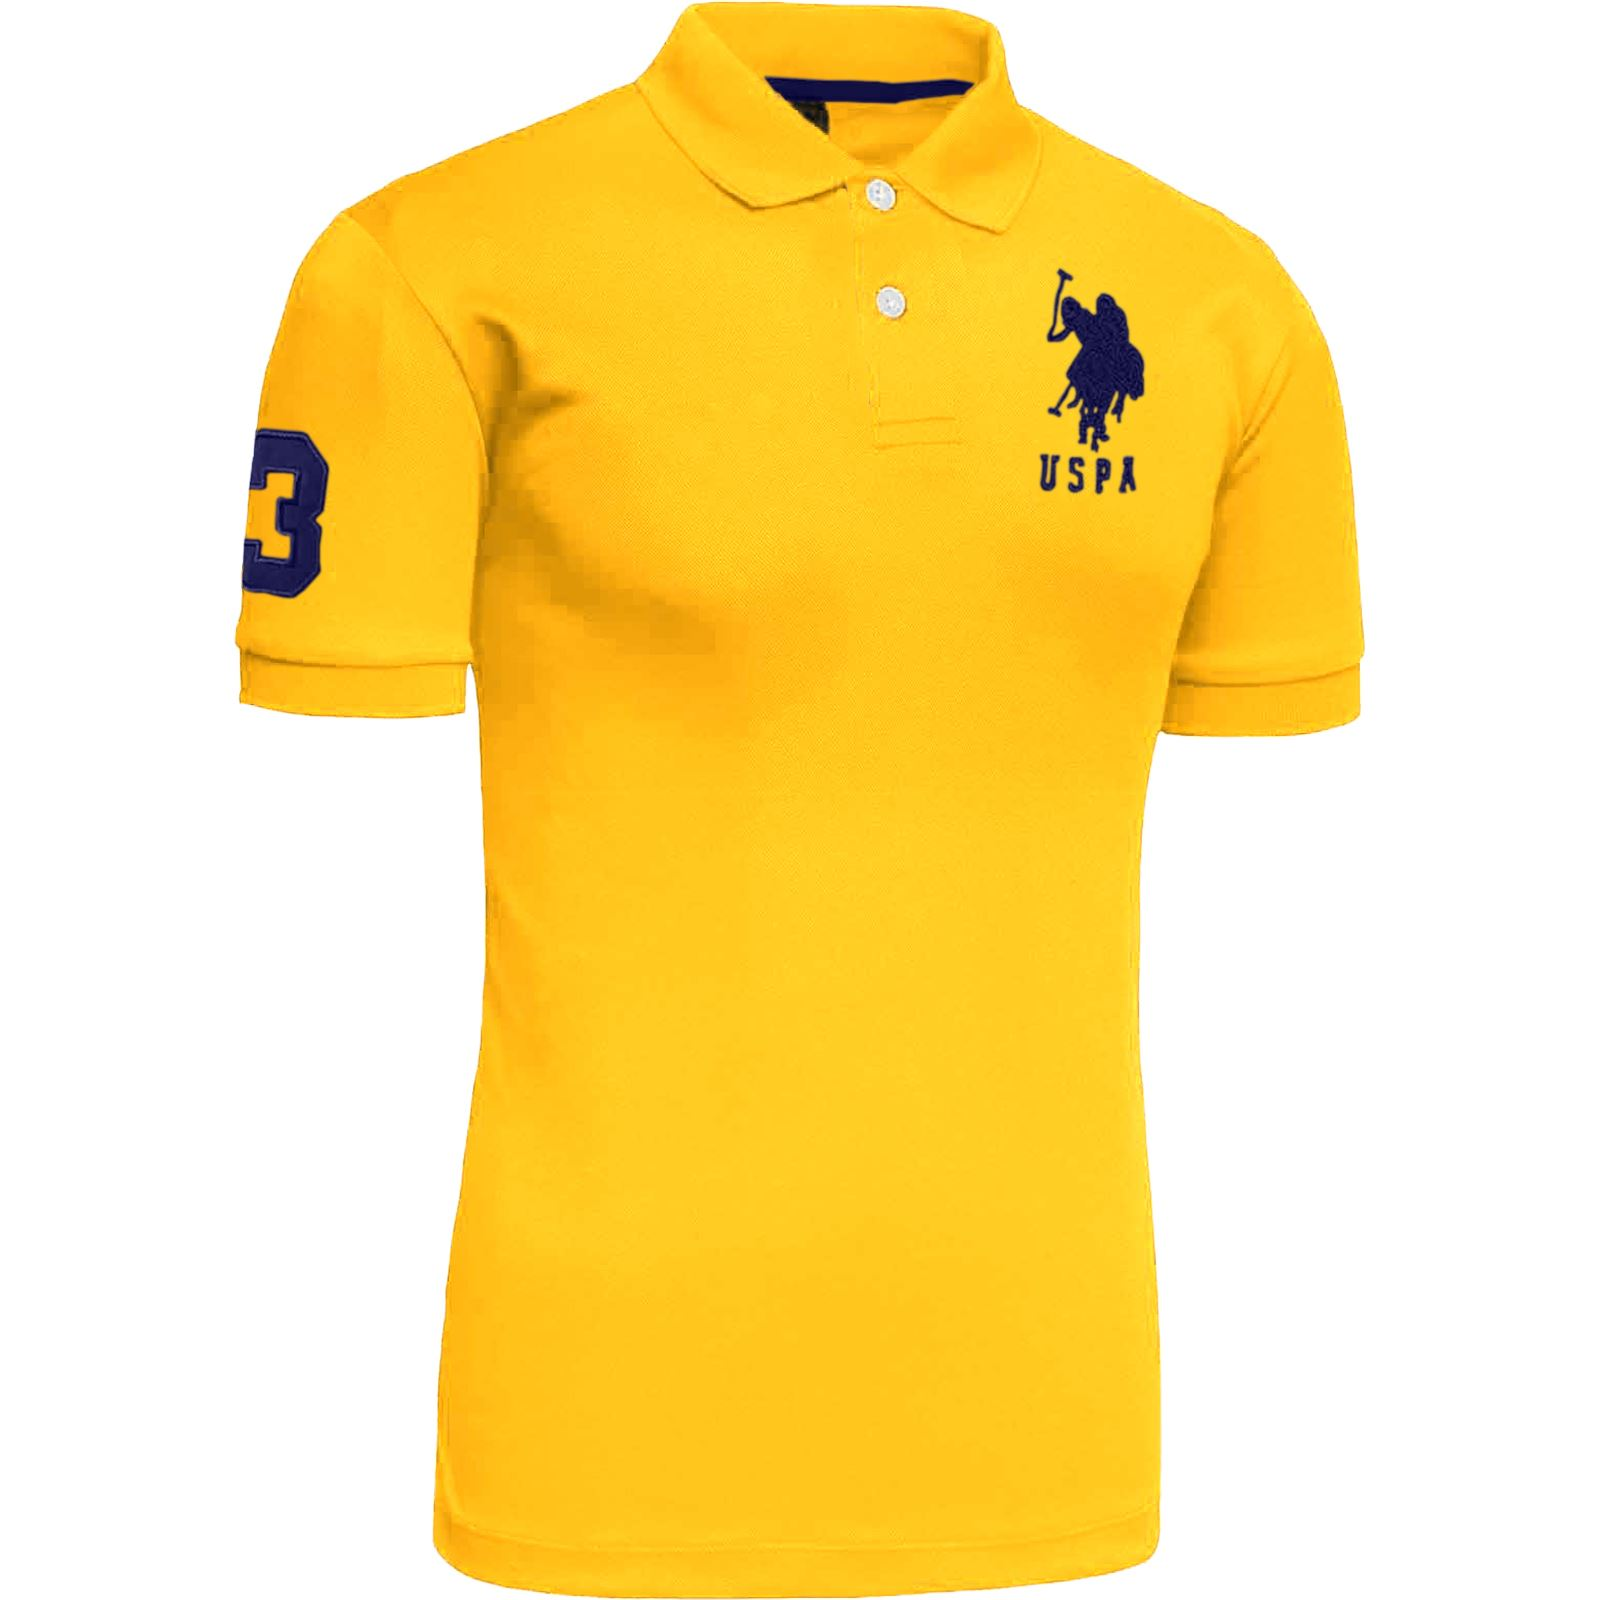 mens us polo assn pique tshirt original shirt branded top